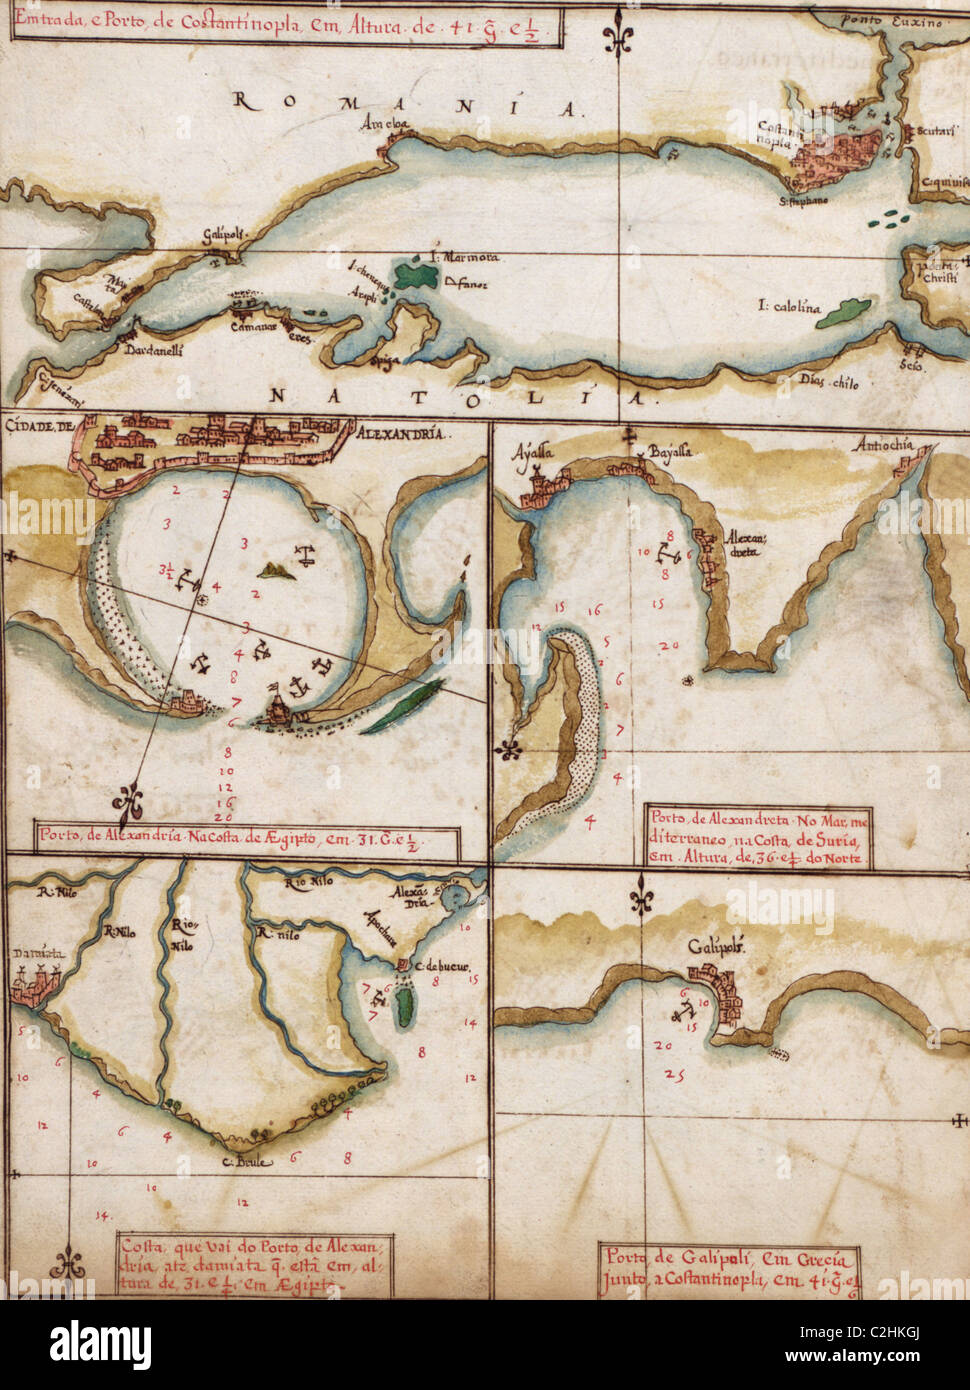 Portuguese maps of Turkey, & the Port of Alexandria - 1630 - Stock Image